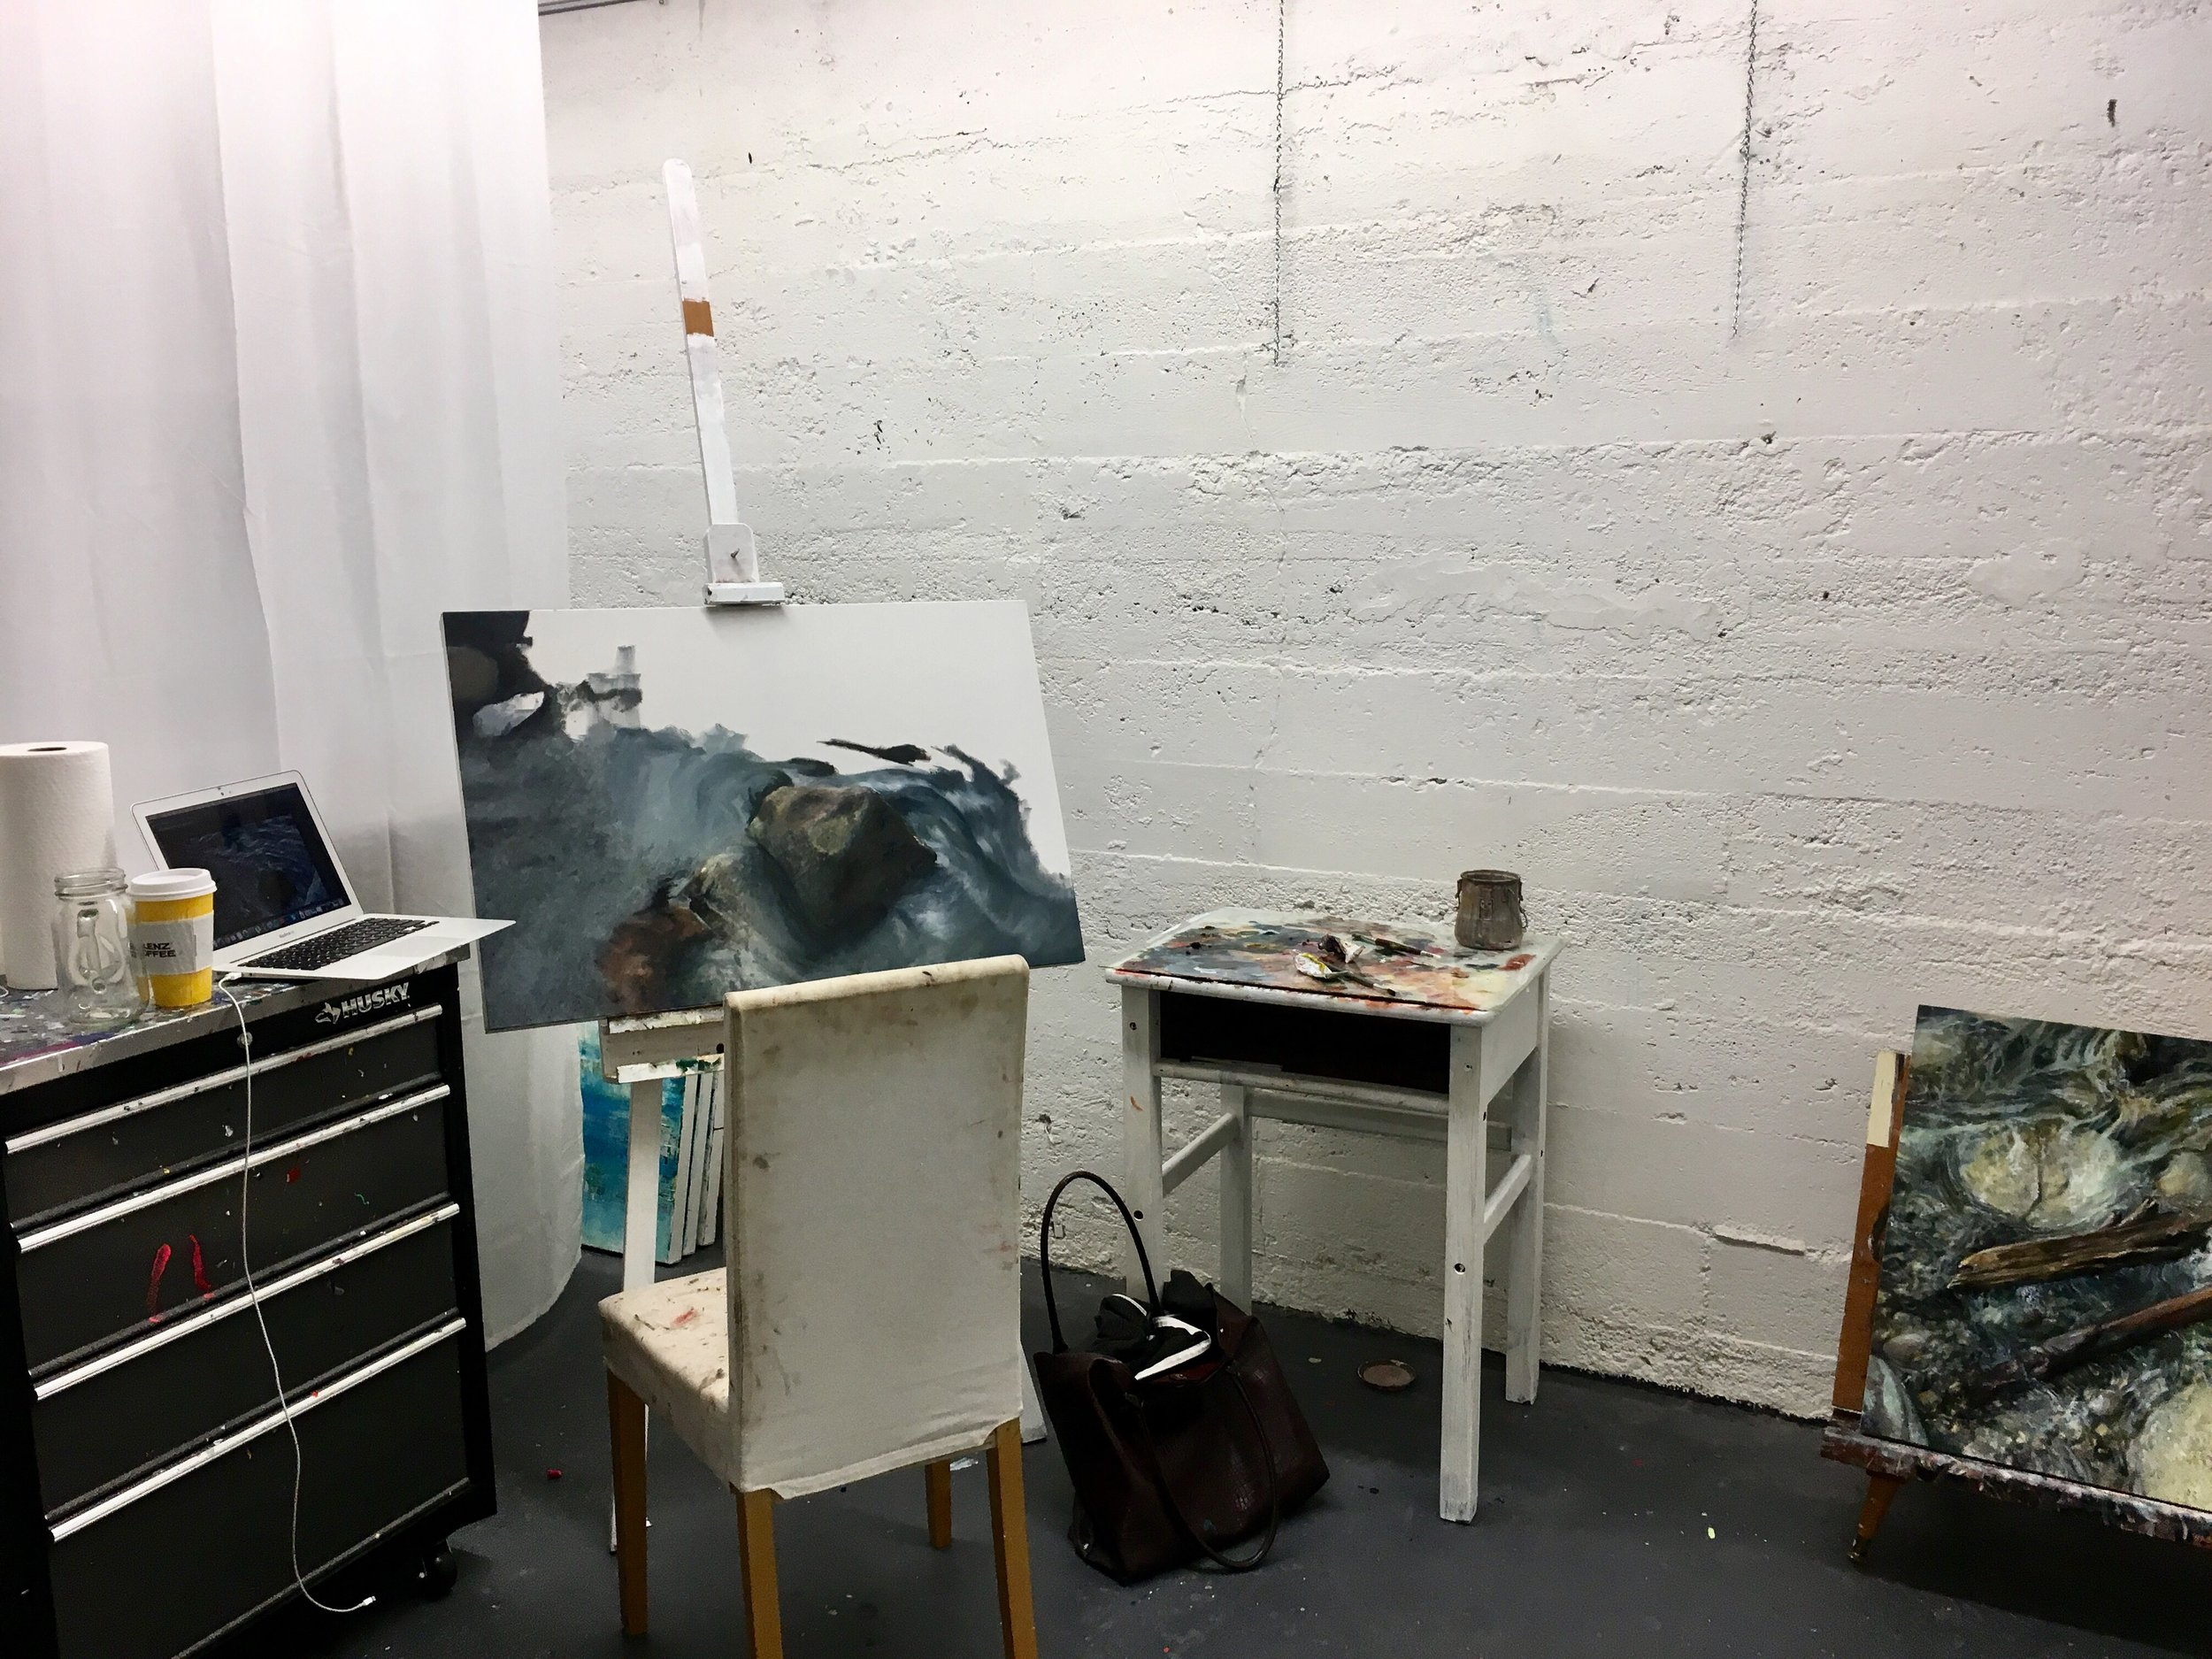 studio wip work in progress landscape oil painting westcoast yaletown realism hyperrealism female artist